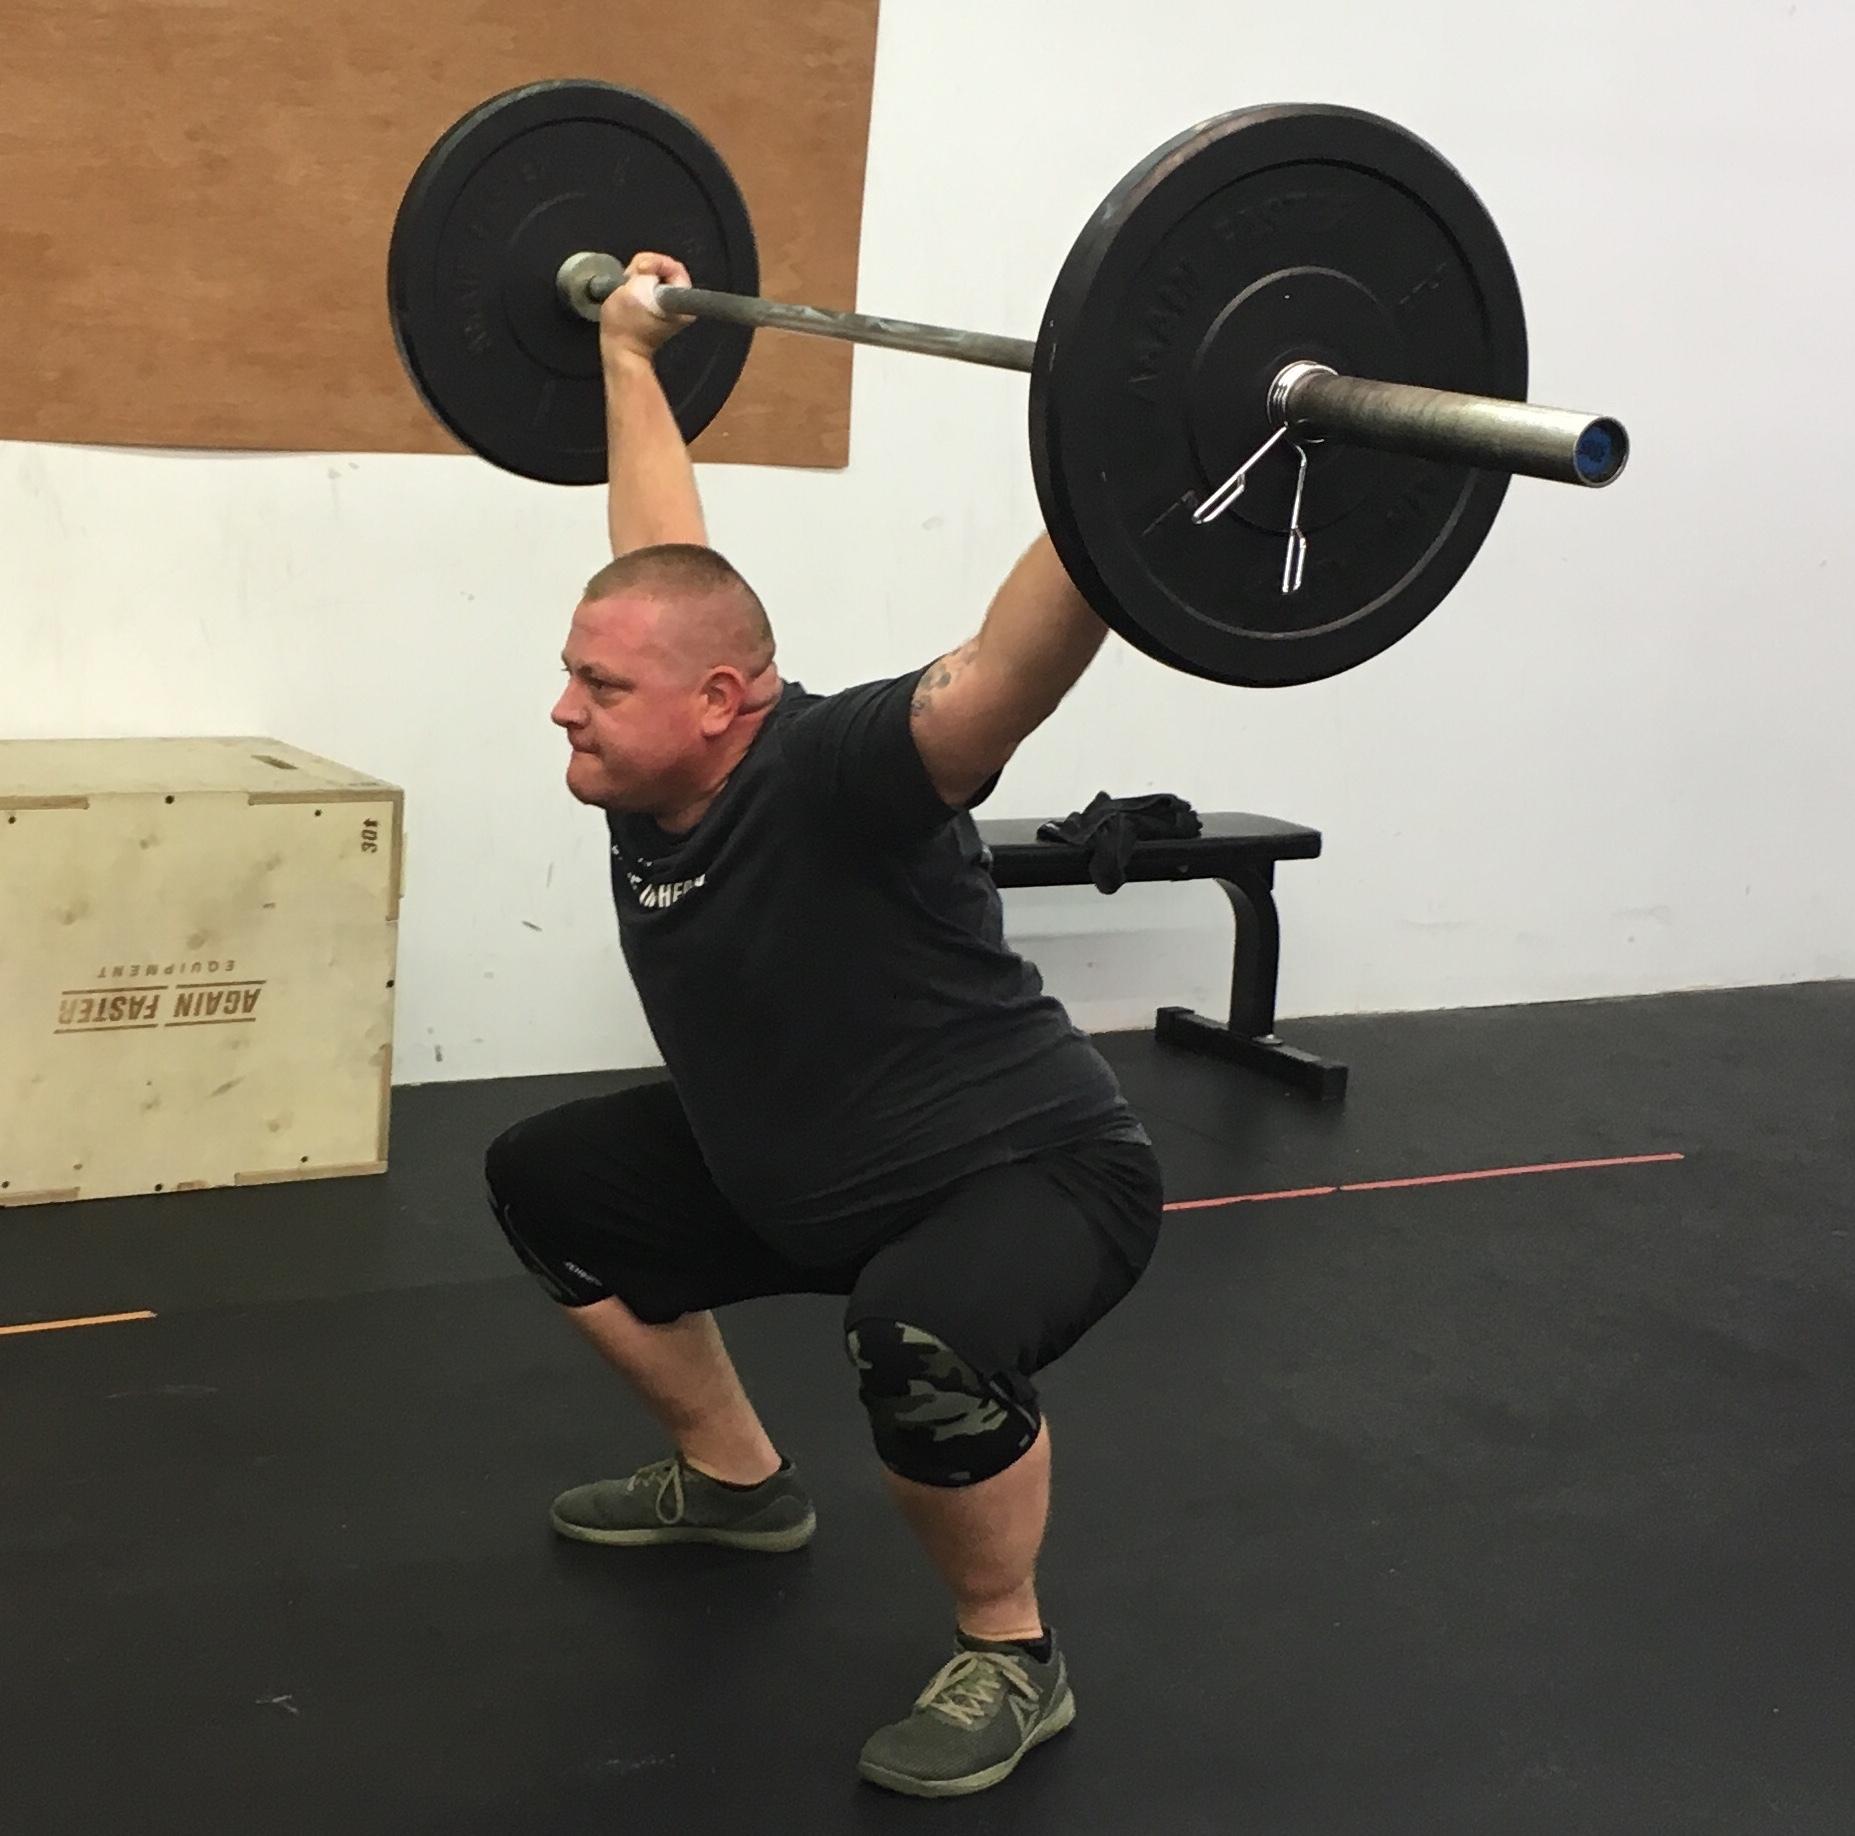 February Athlete of the Month - Cory Ballard